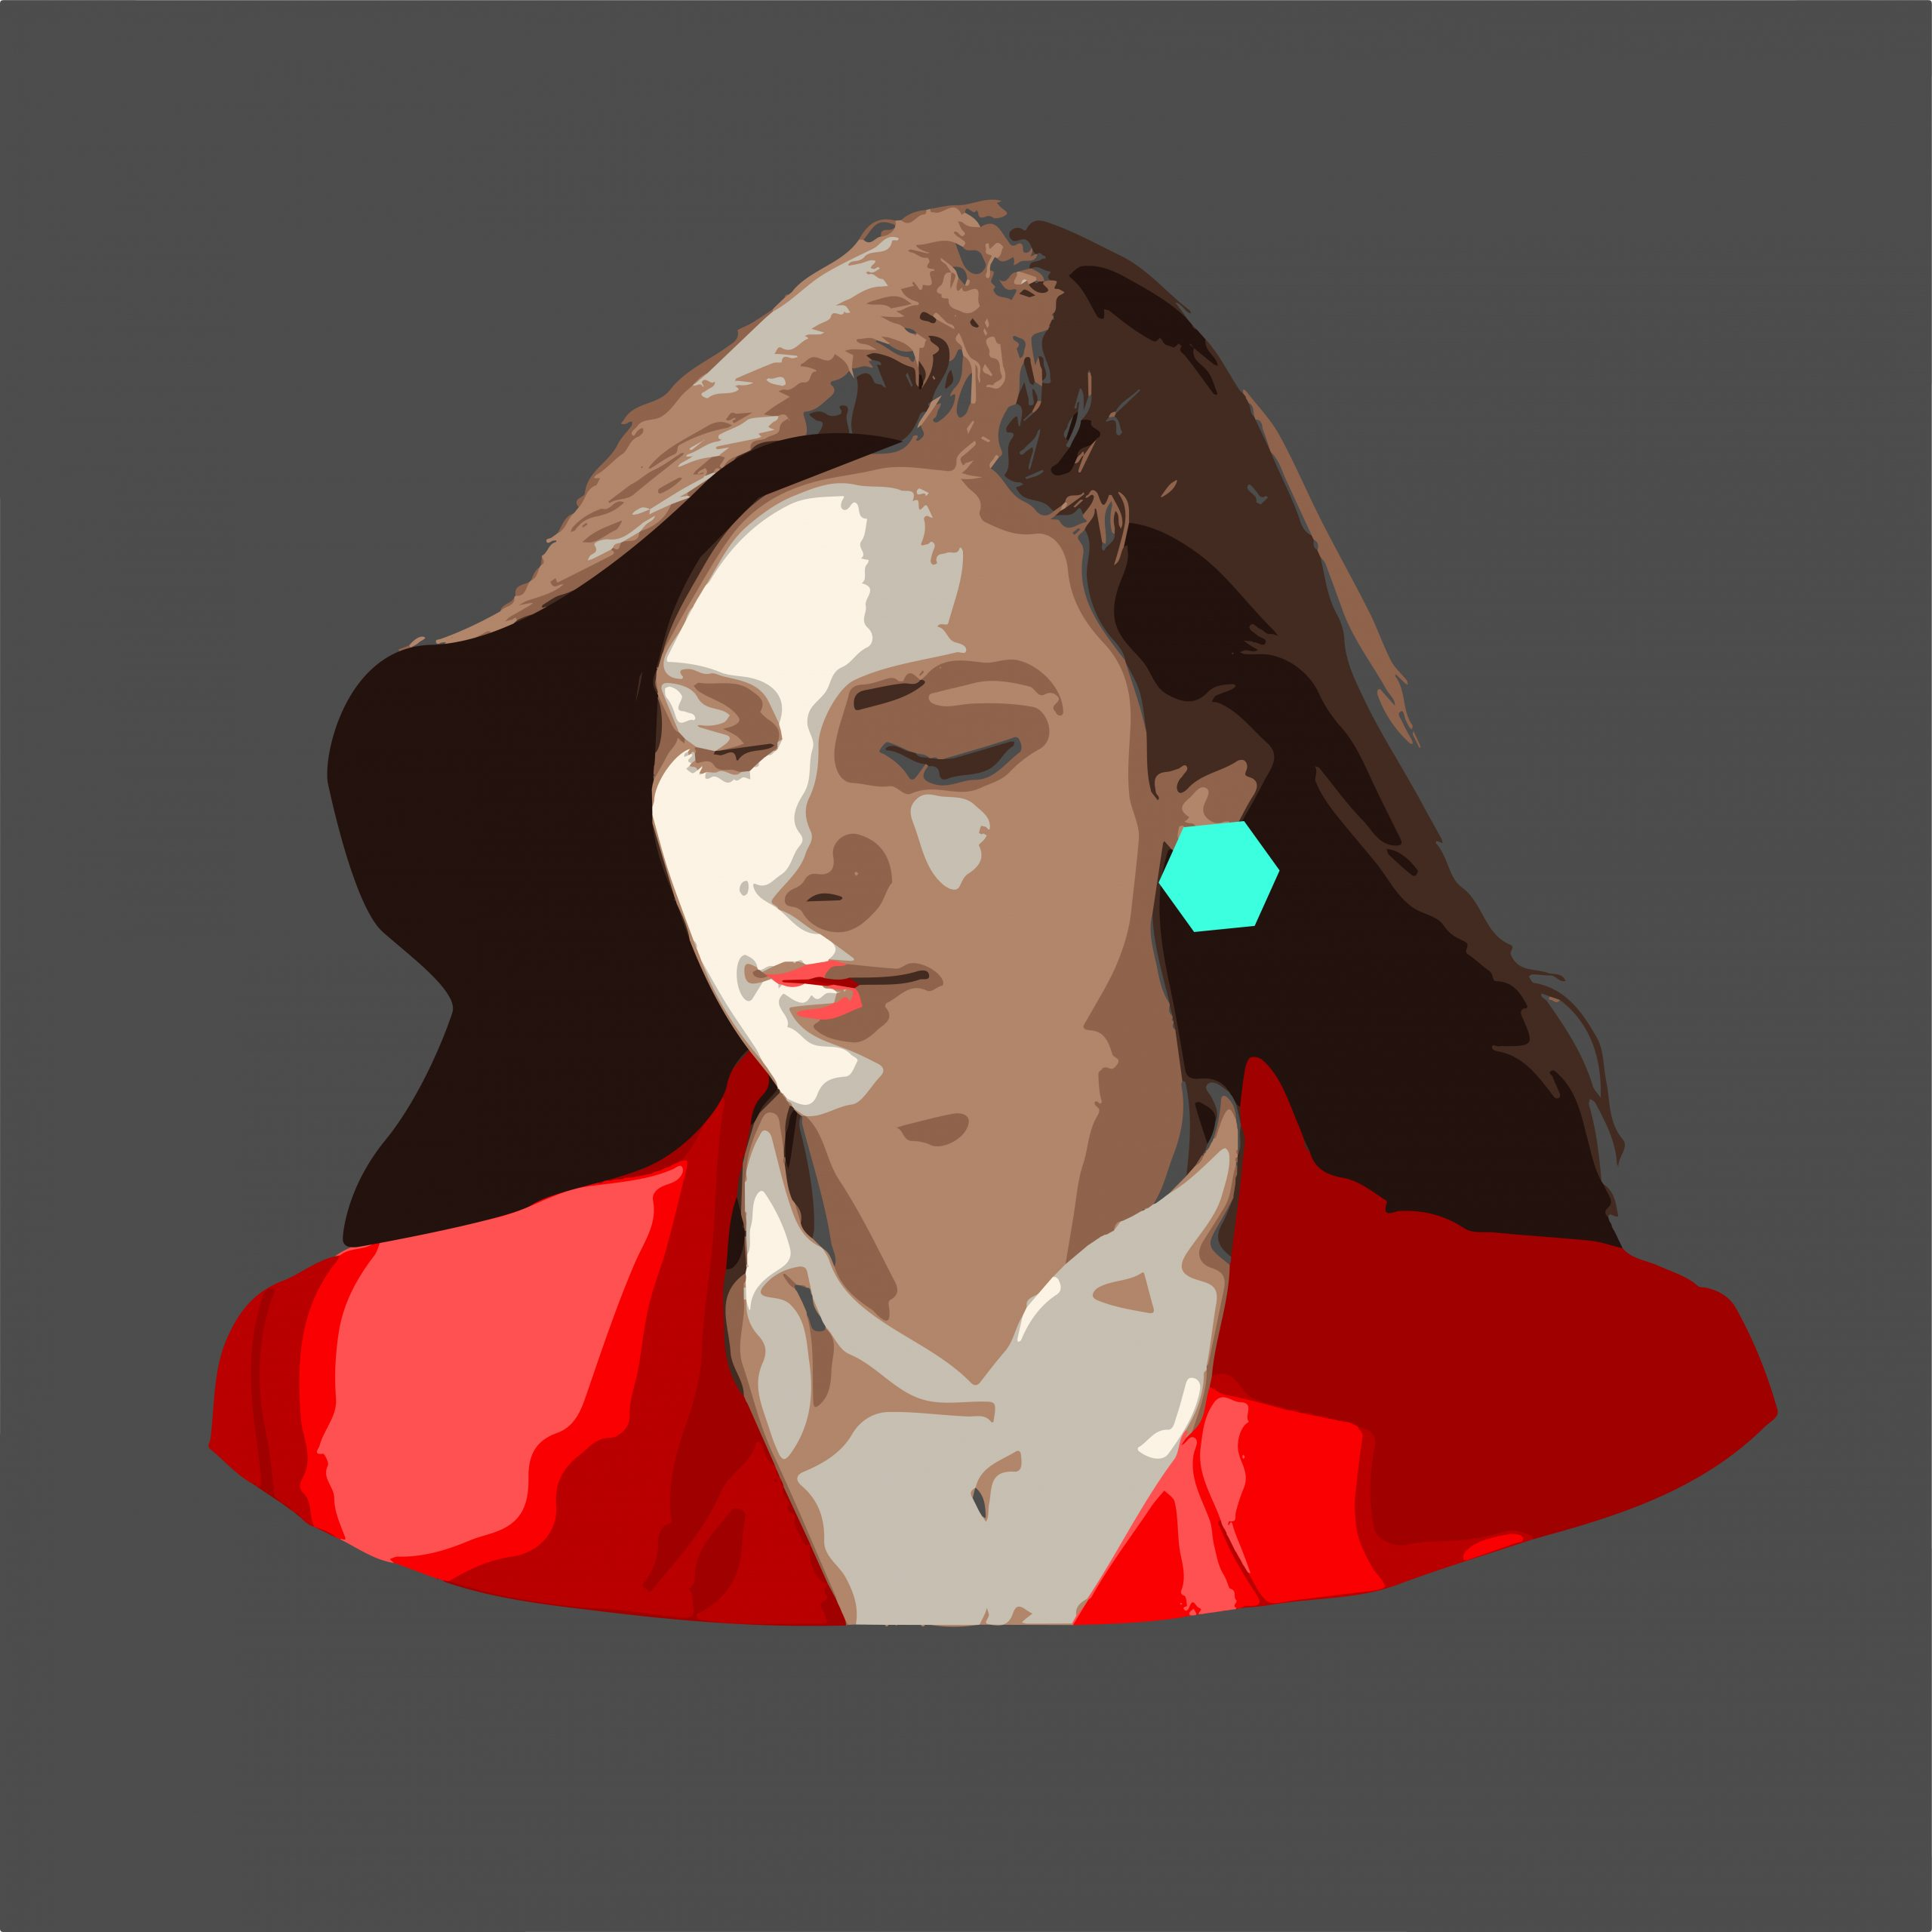 A stylish girl illustration